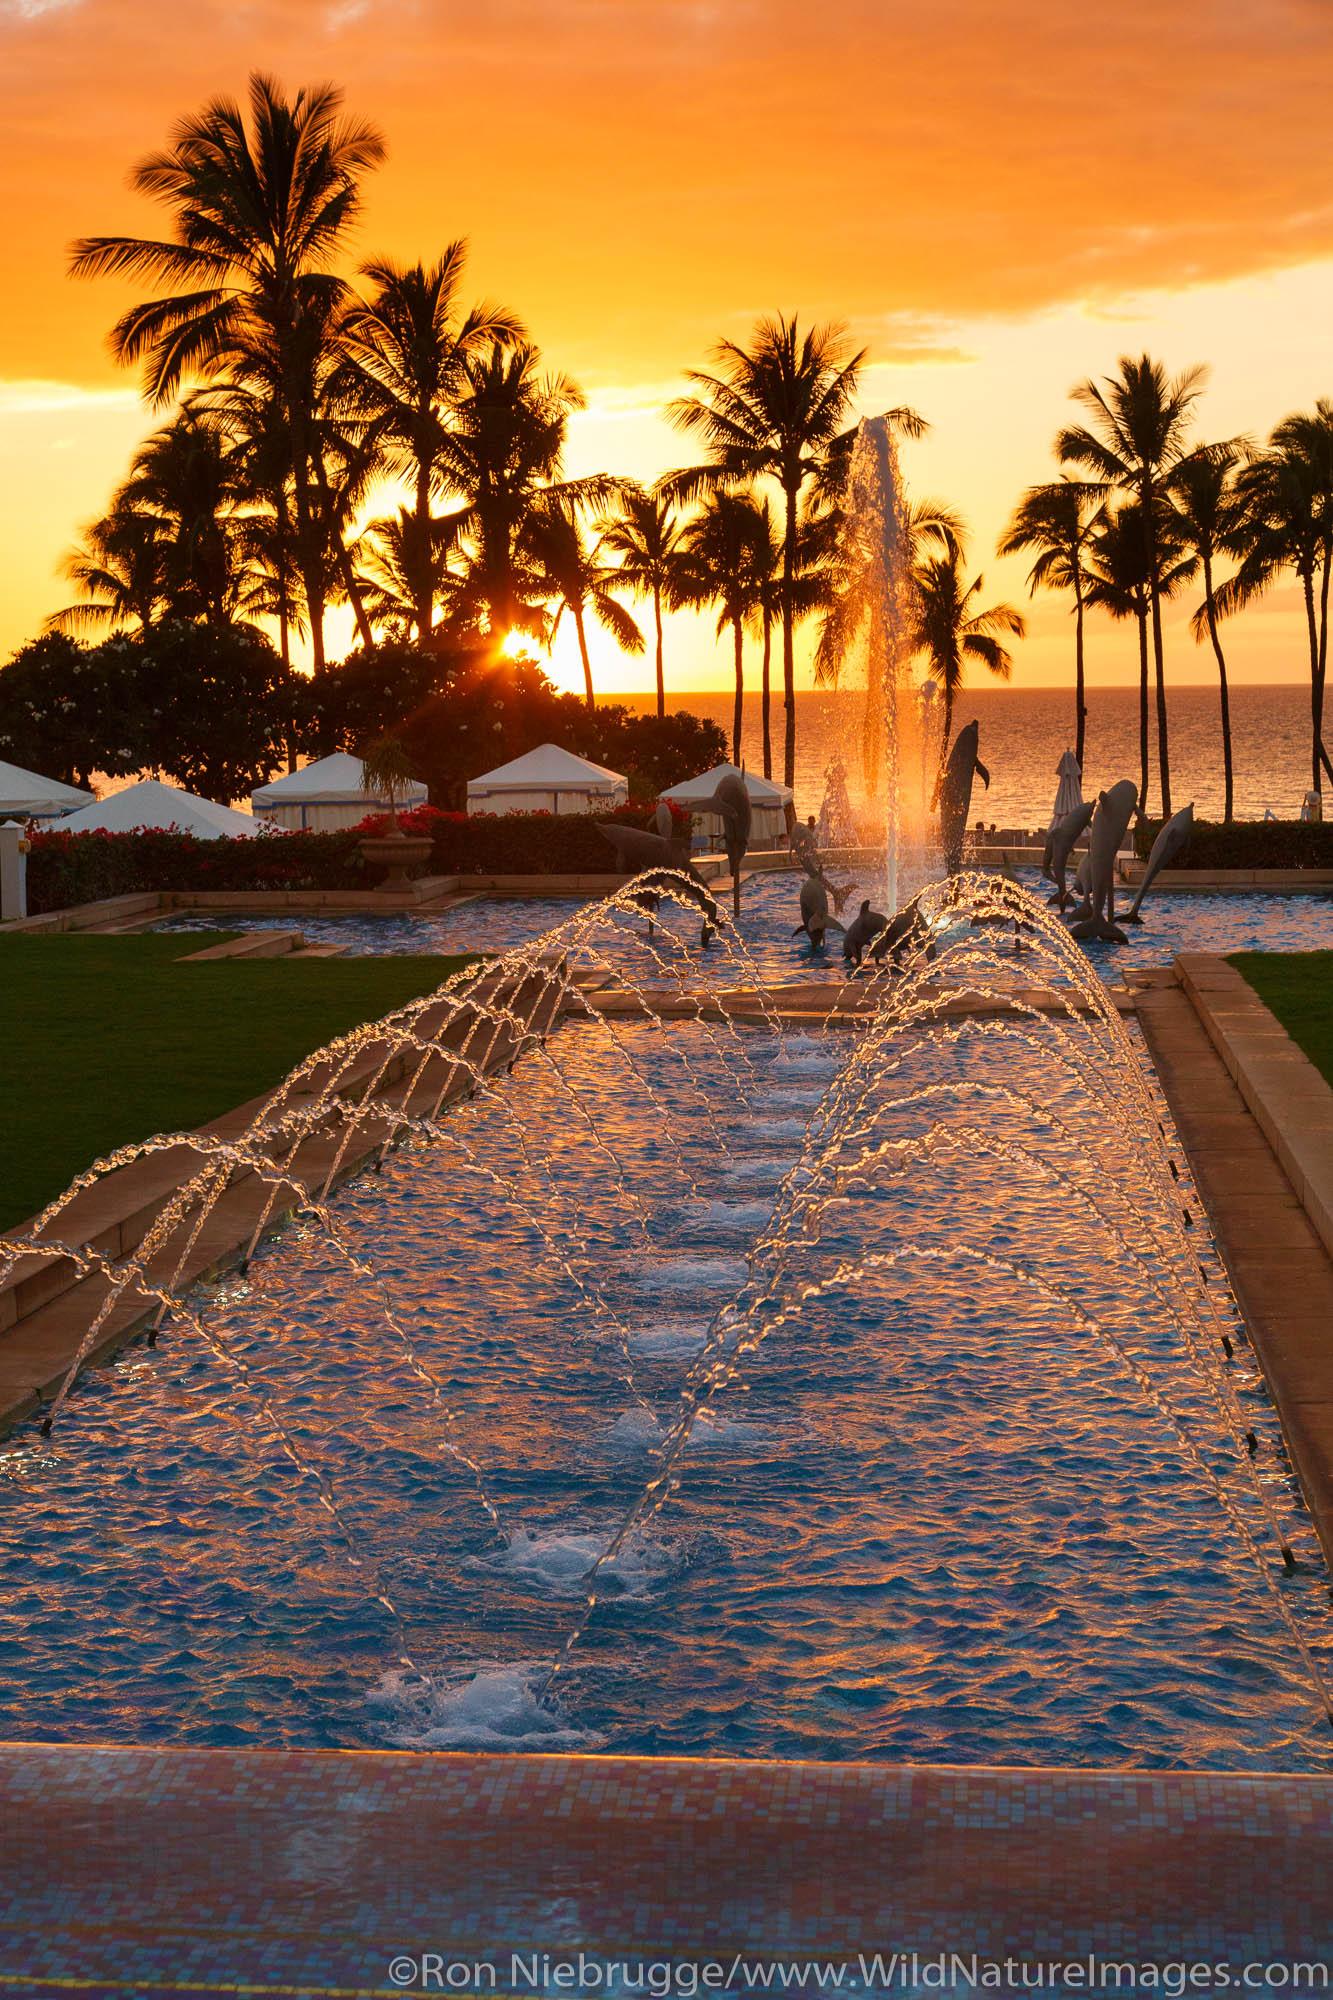 Sunset, Grand Wailea, Maui, Hawaii.